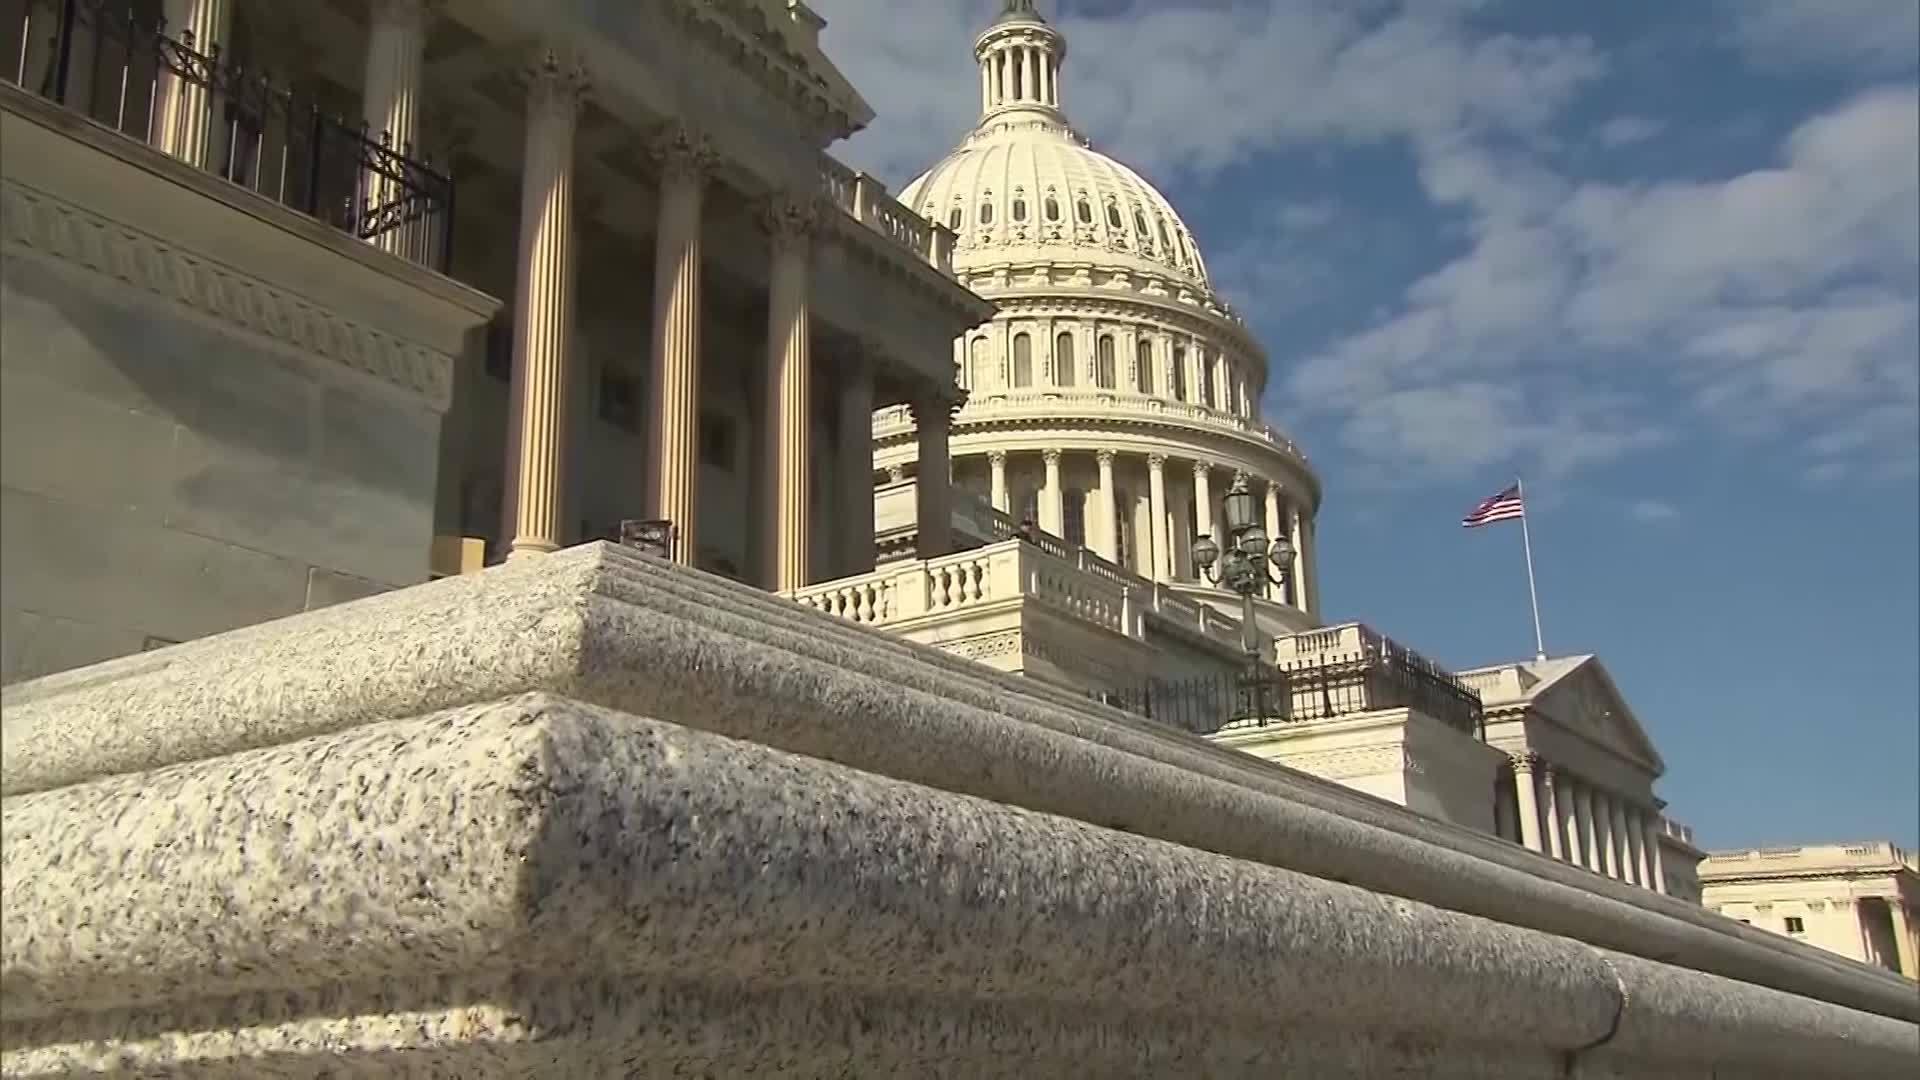 House_passes_two_bills_to_strengthen_gun_0_20190301153324-118809306